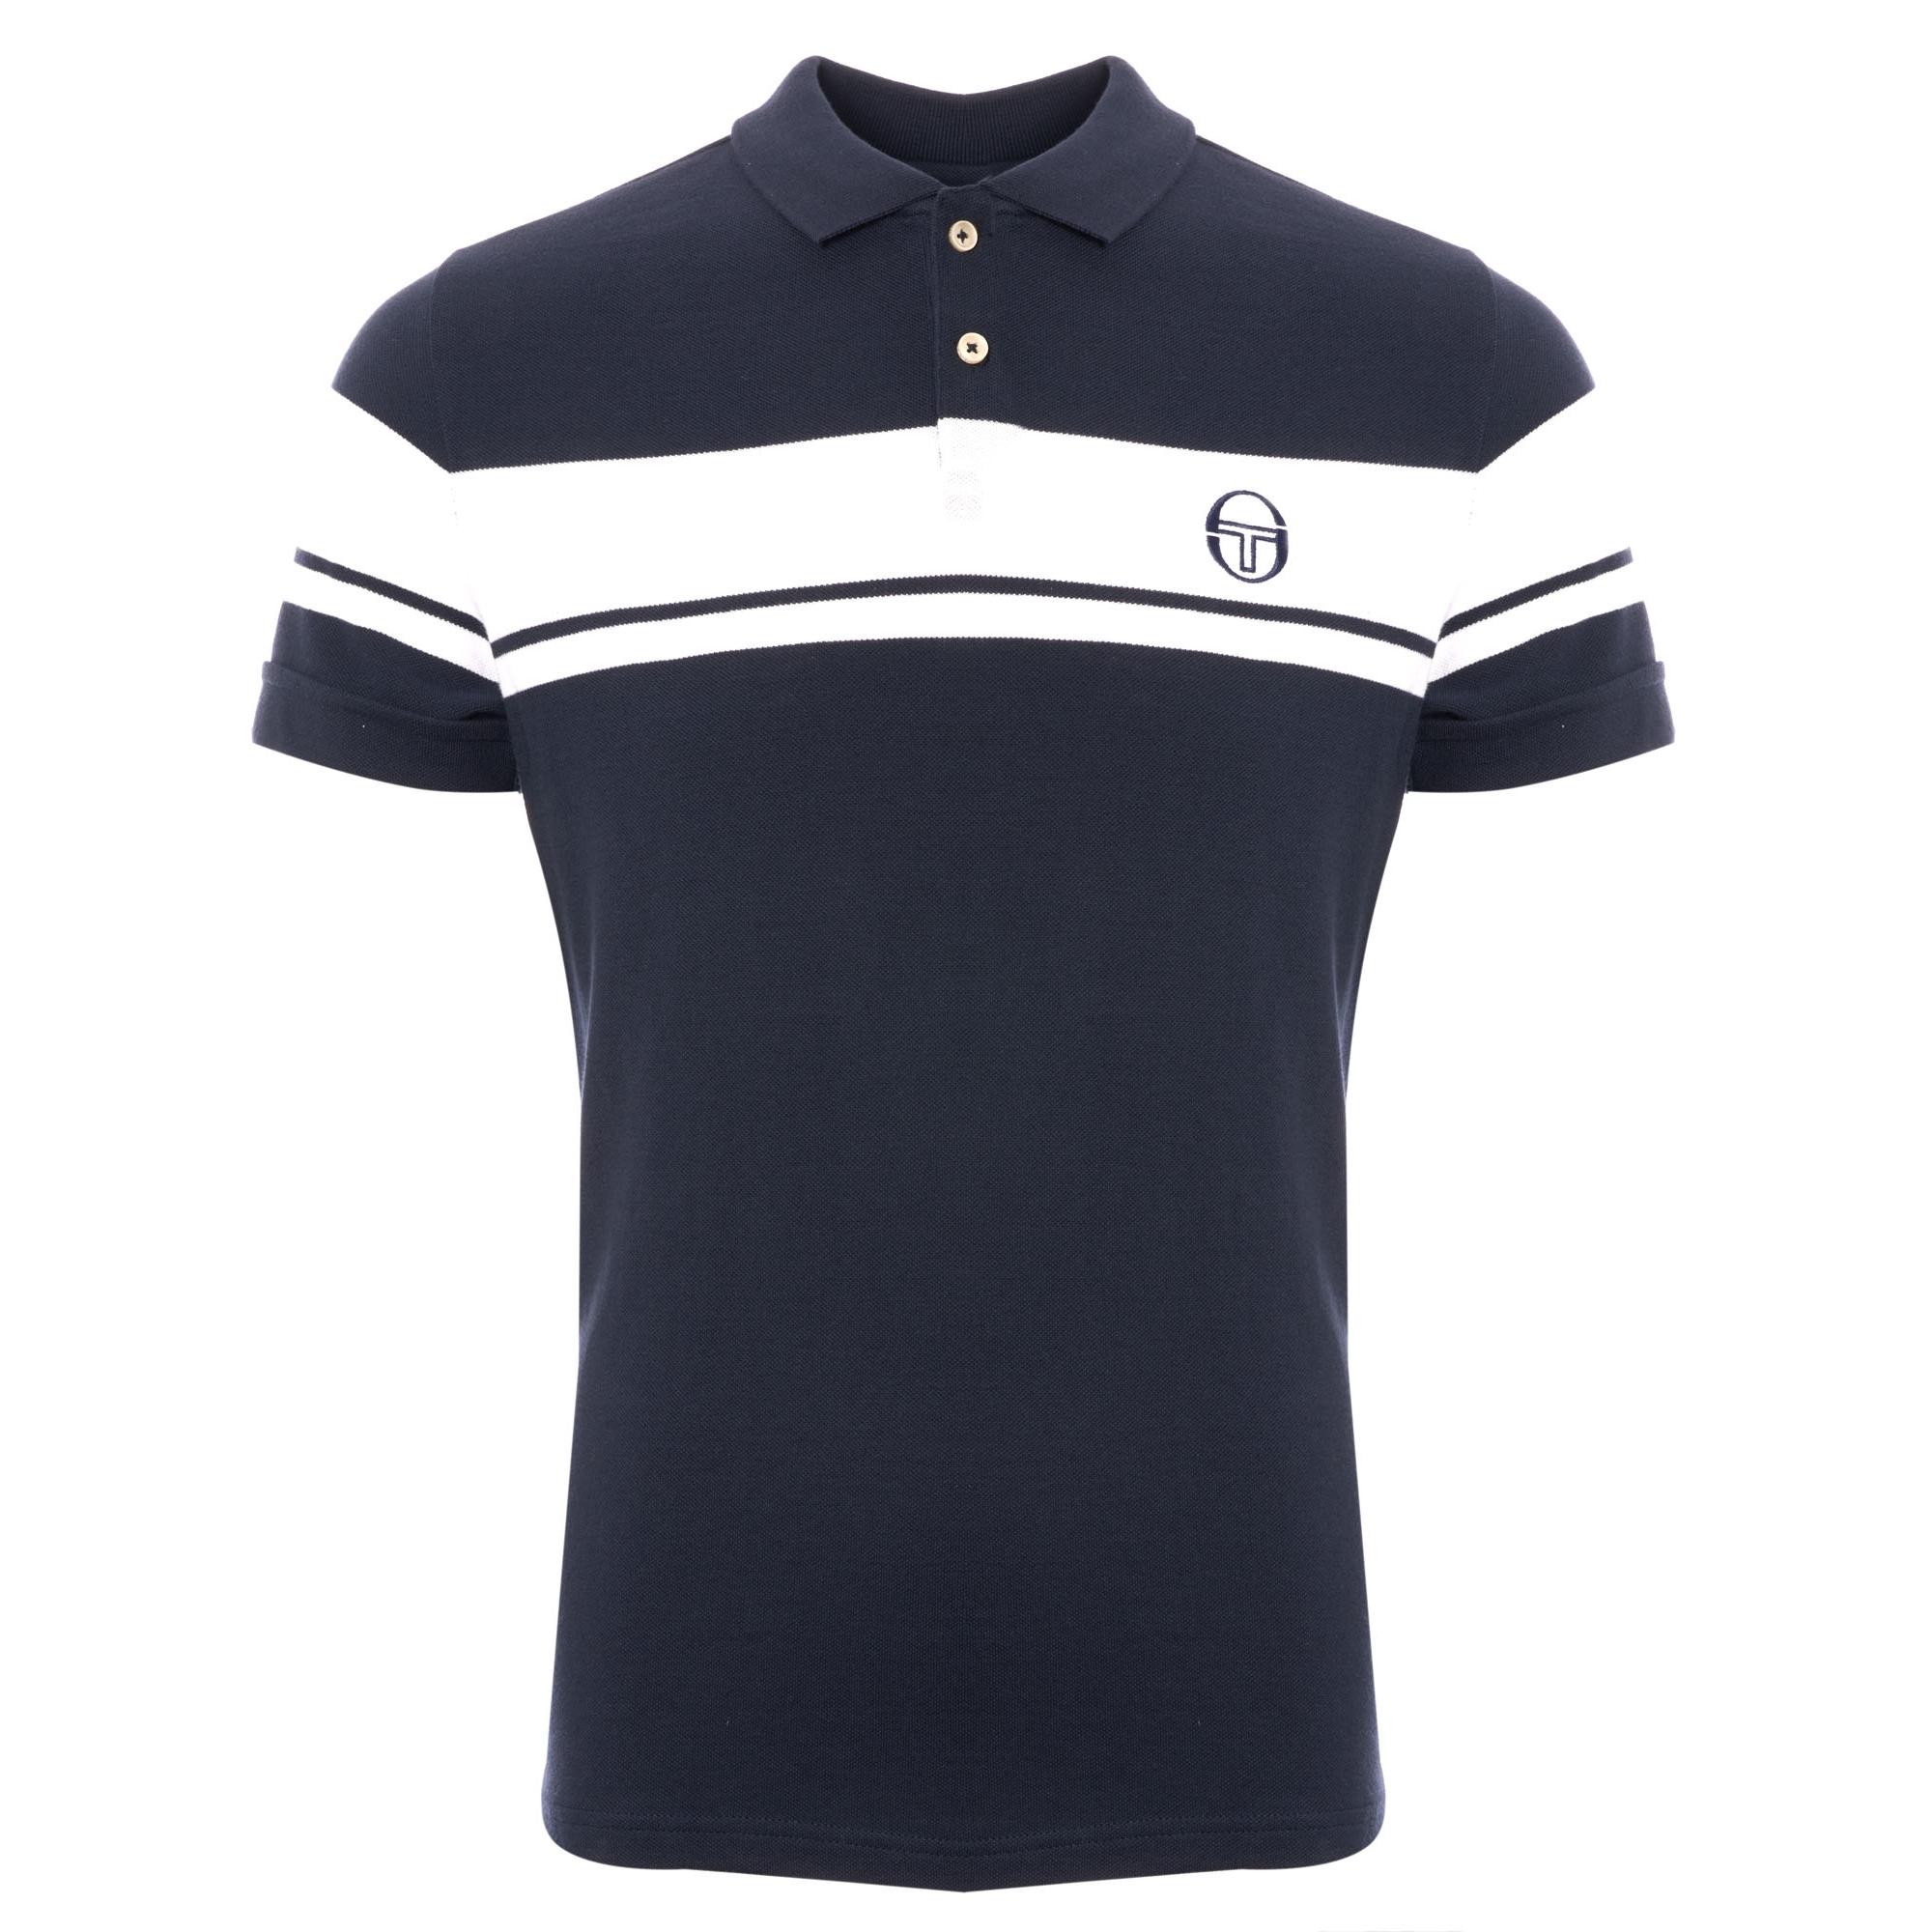 3cbbb17ce Sergio Tacchini Young Line Polo Shirt   Navy & White   36639-002